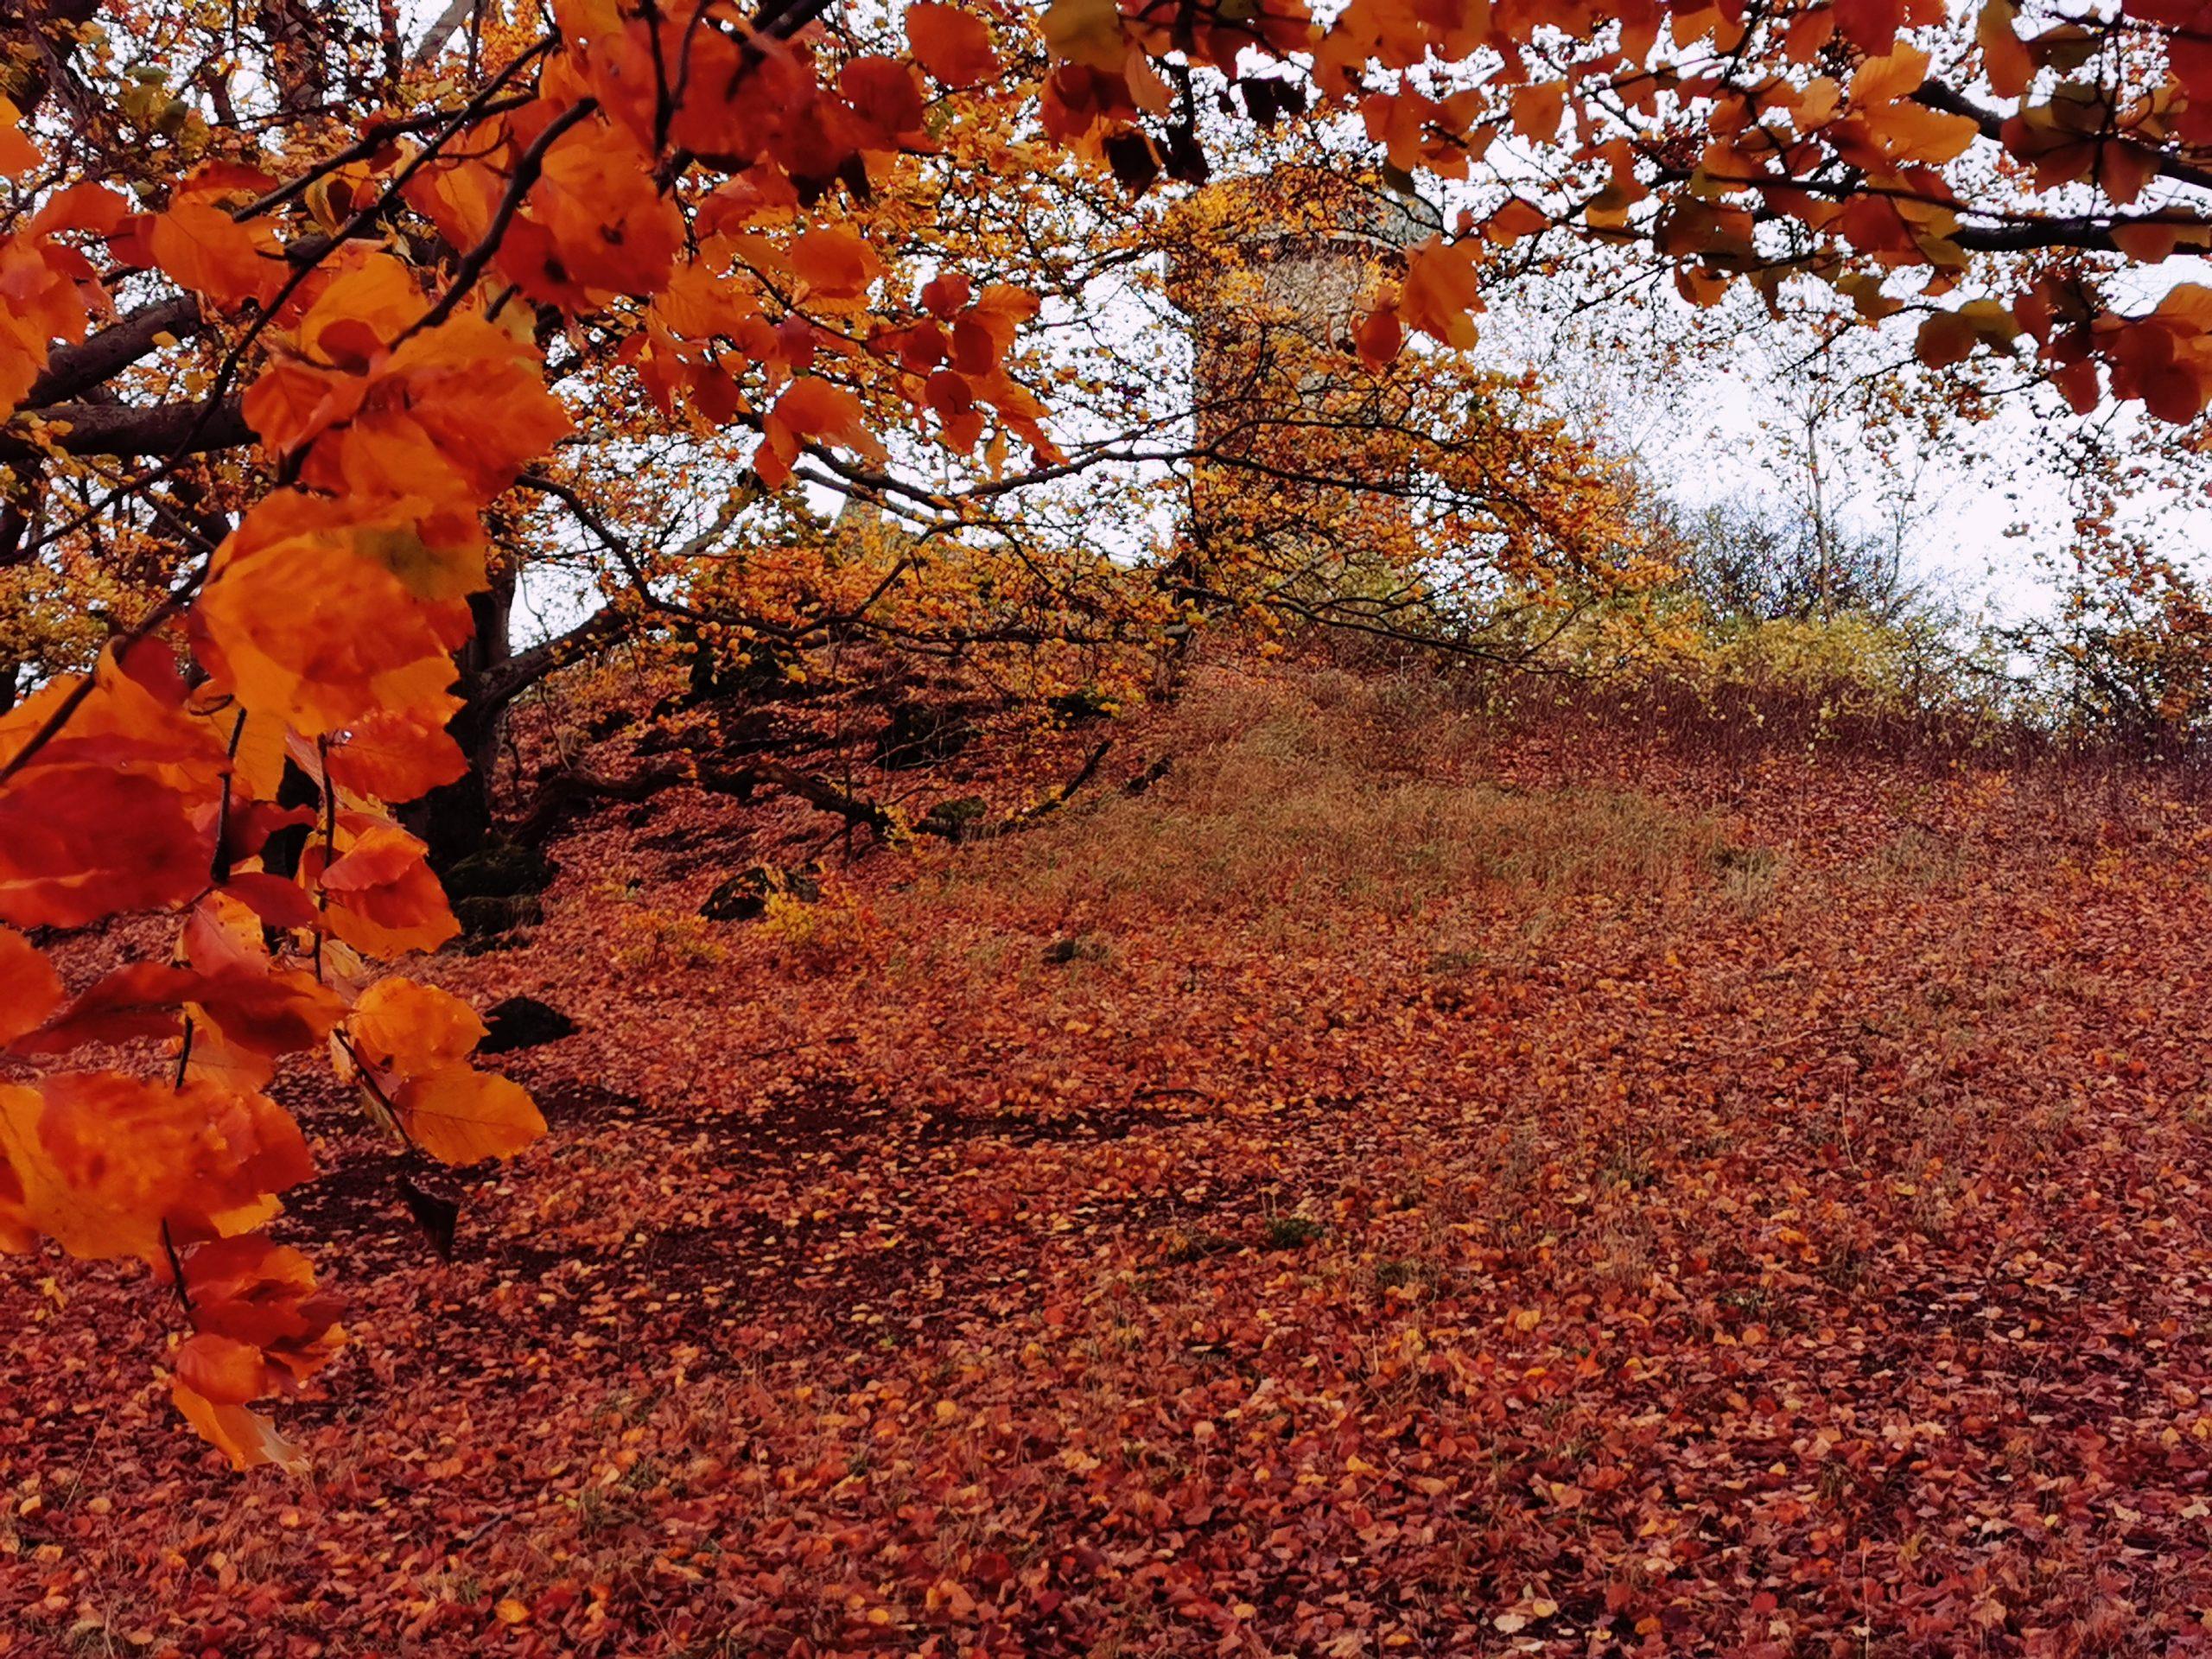 Herbst am Knüllköpfchen